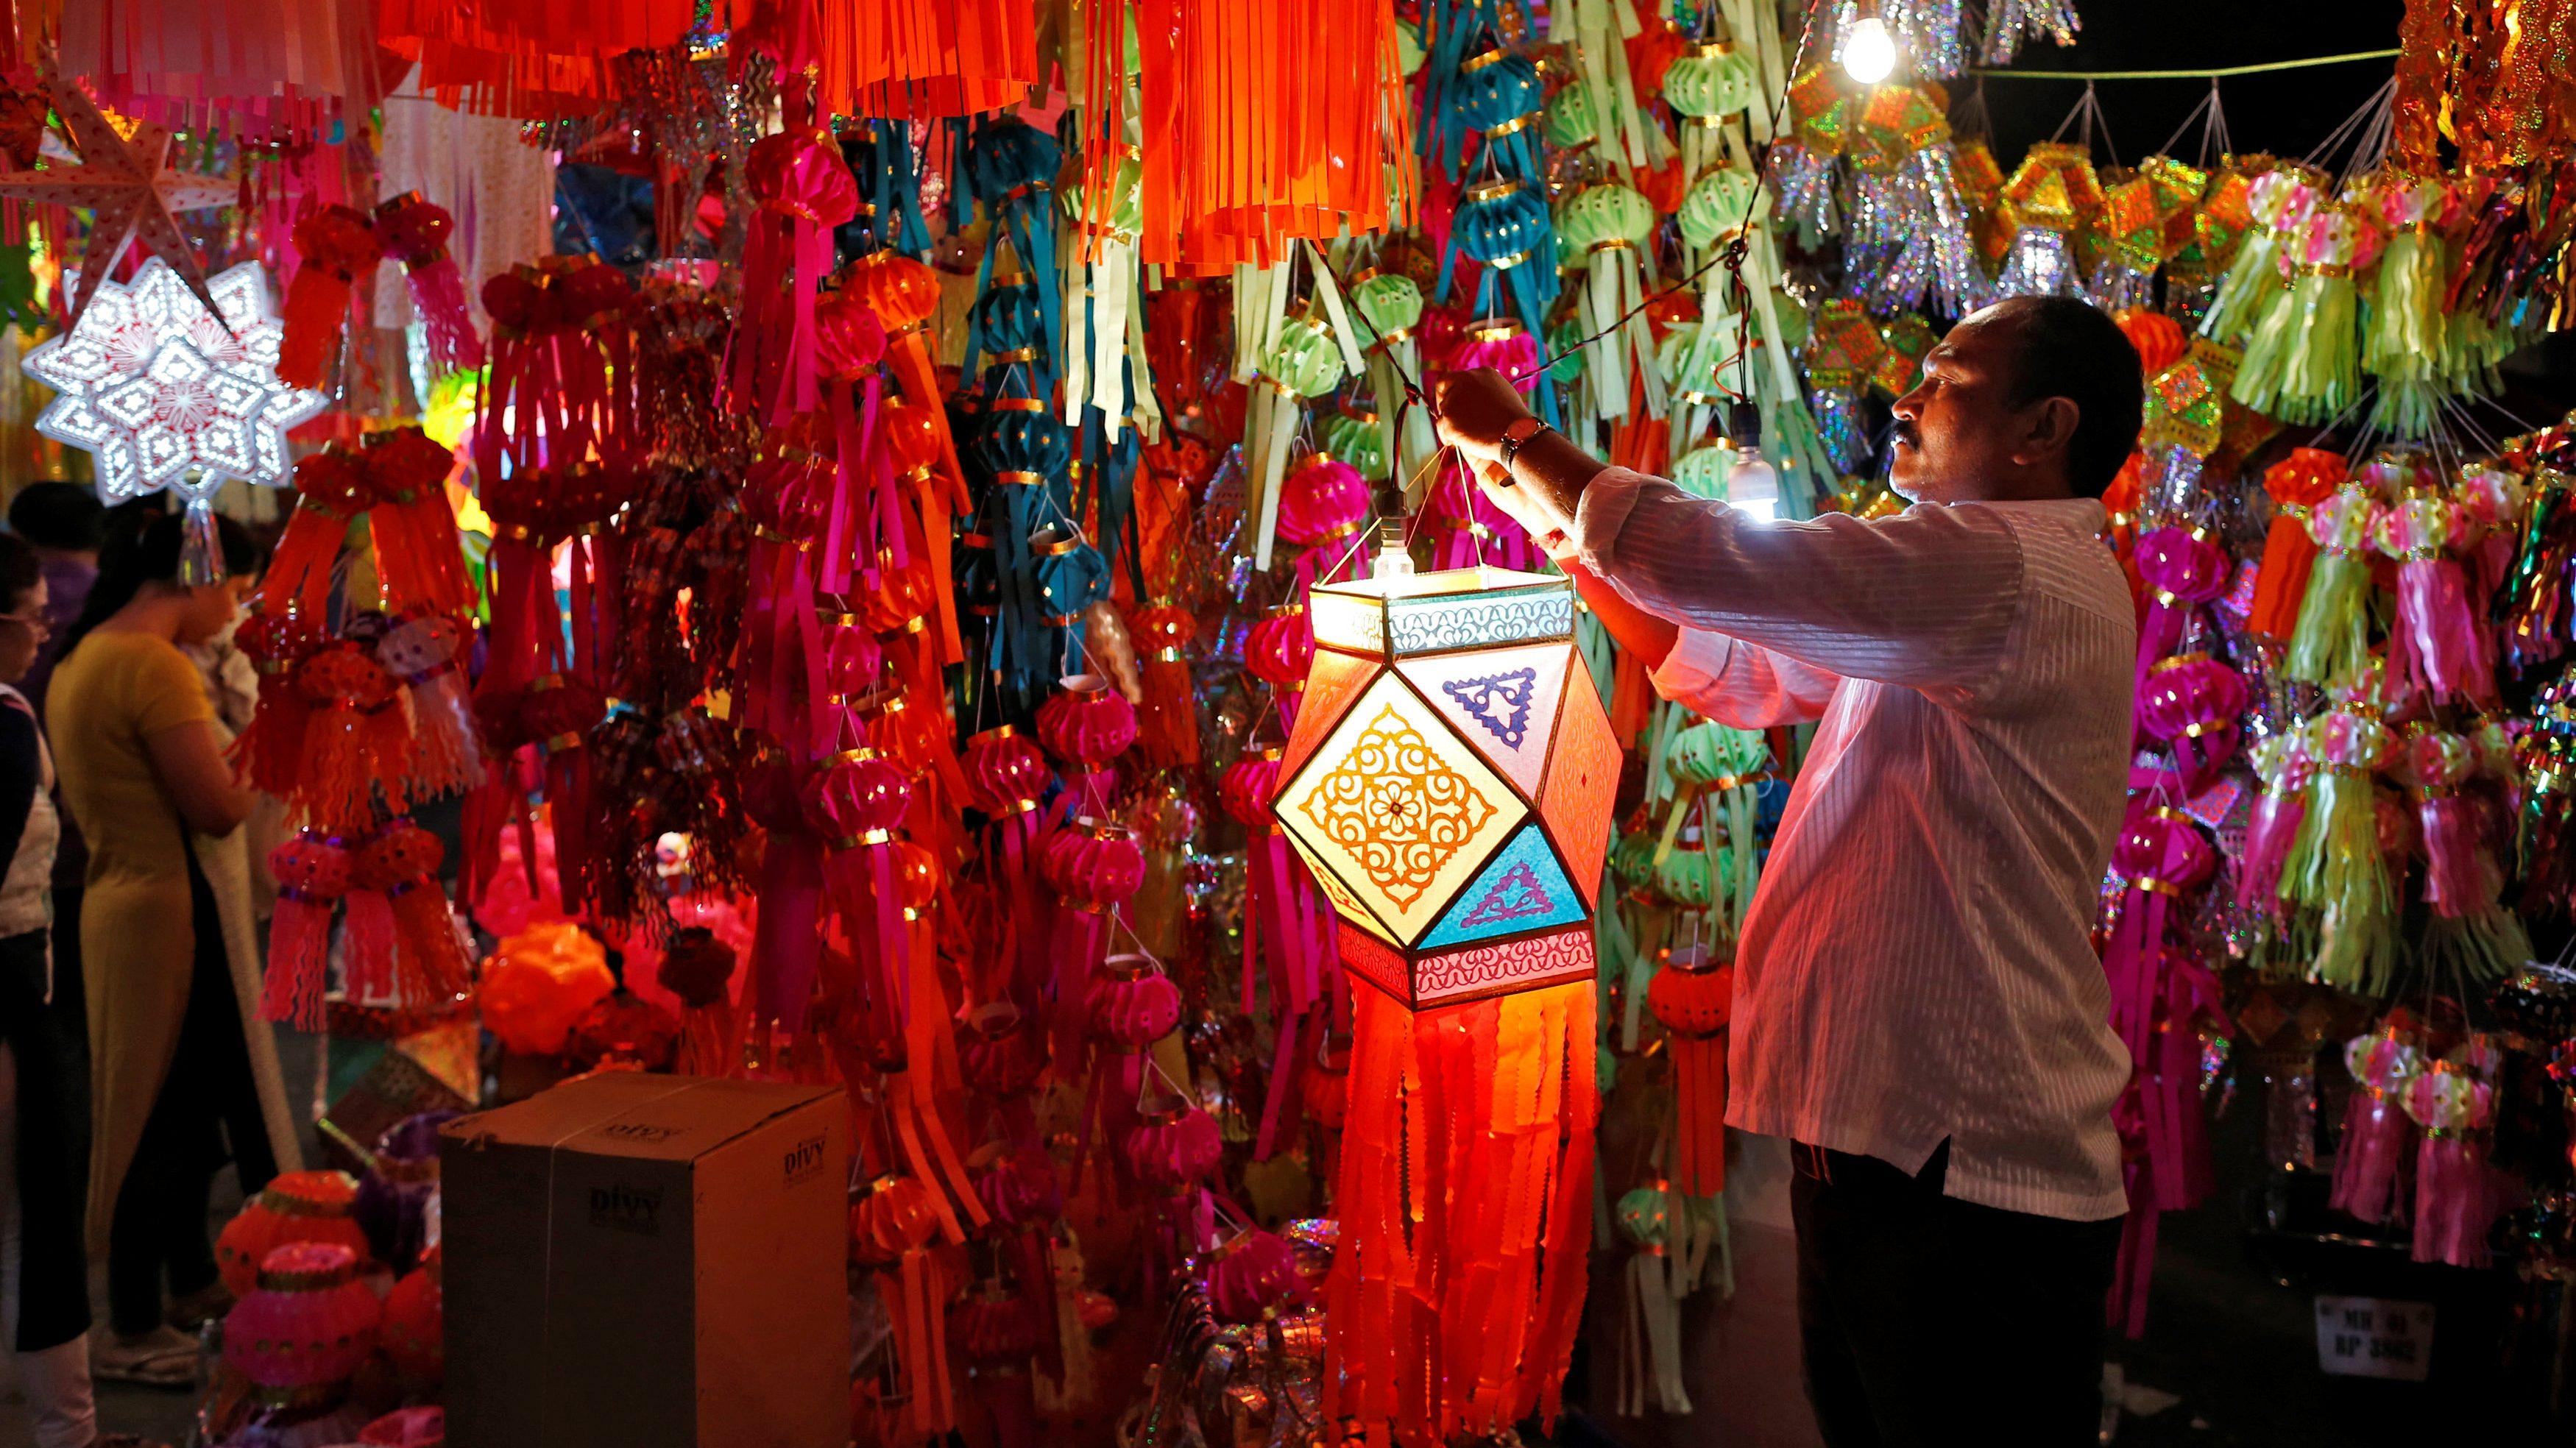 A vendor hangs a lantern for sale at a roadside market ahead of the Hindu festival of Diwali in Mumbai